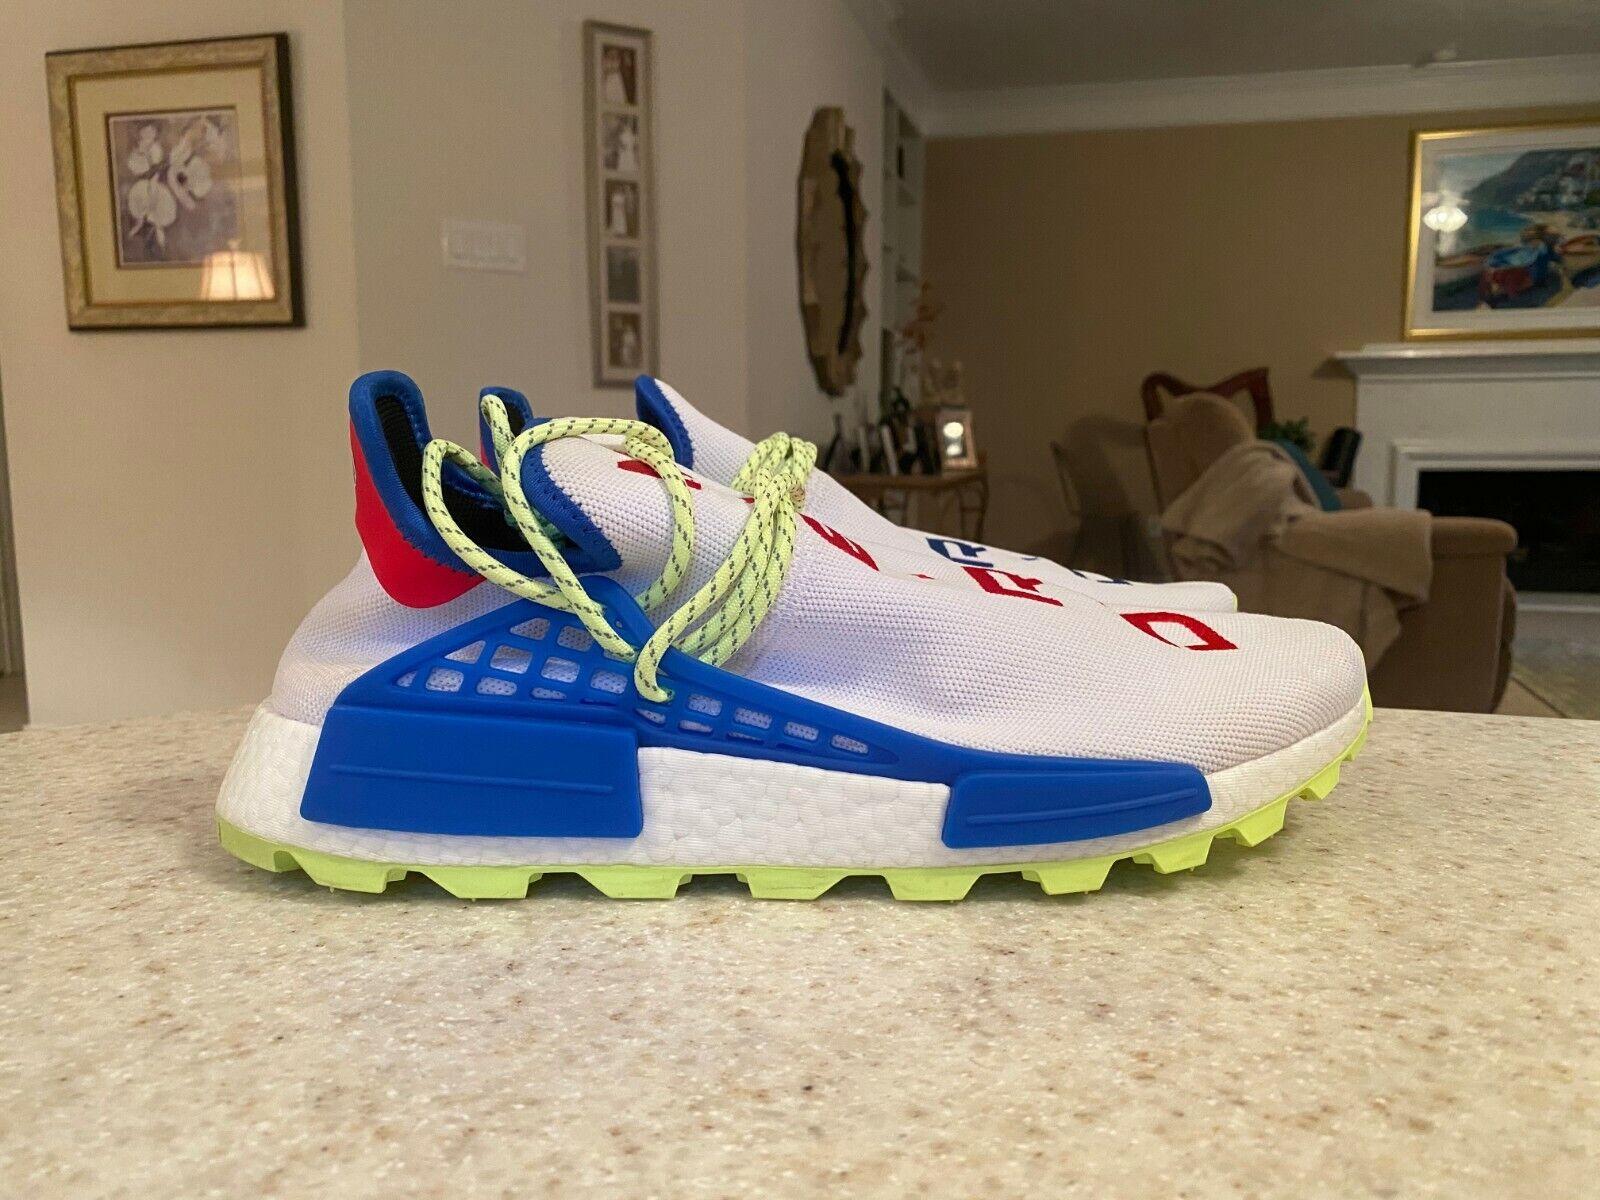 Adidas Pharrell Williams N.E.R.D Human Race NMD Size 12.5 NMD Ultra Boost (PE)